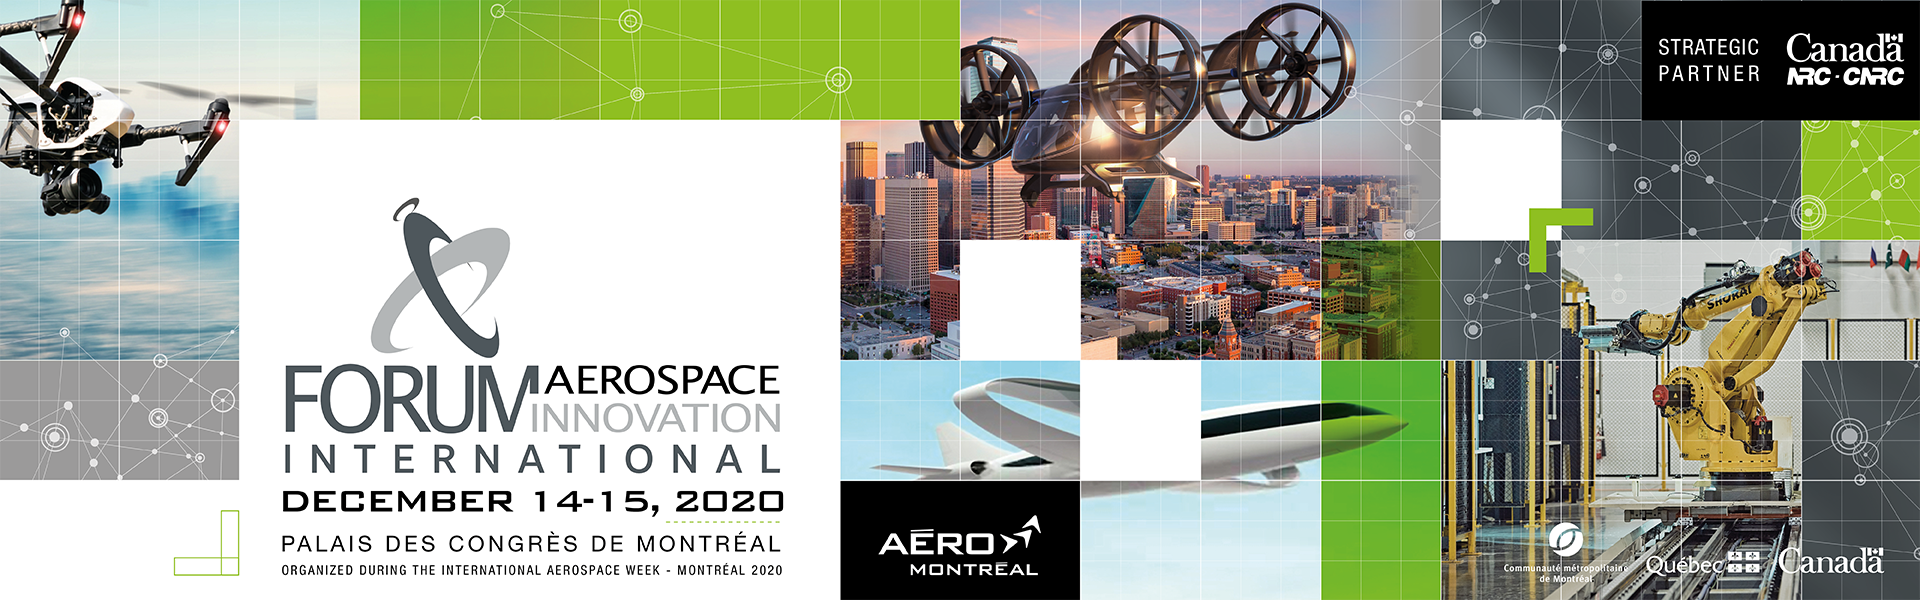 International Aerospace Innovation Forum 2020